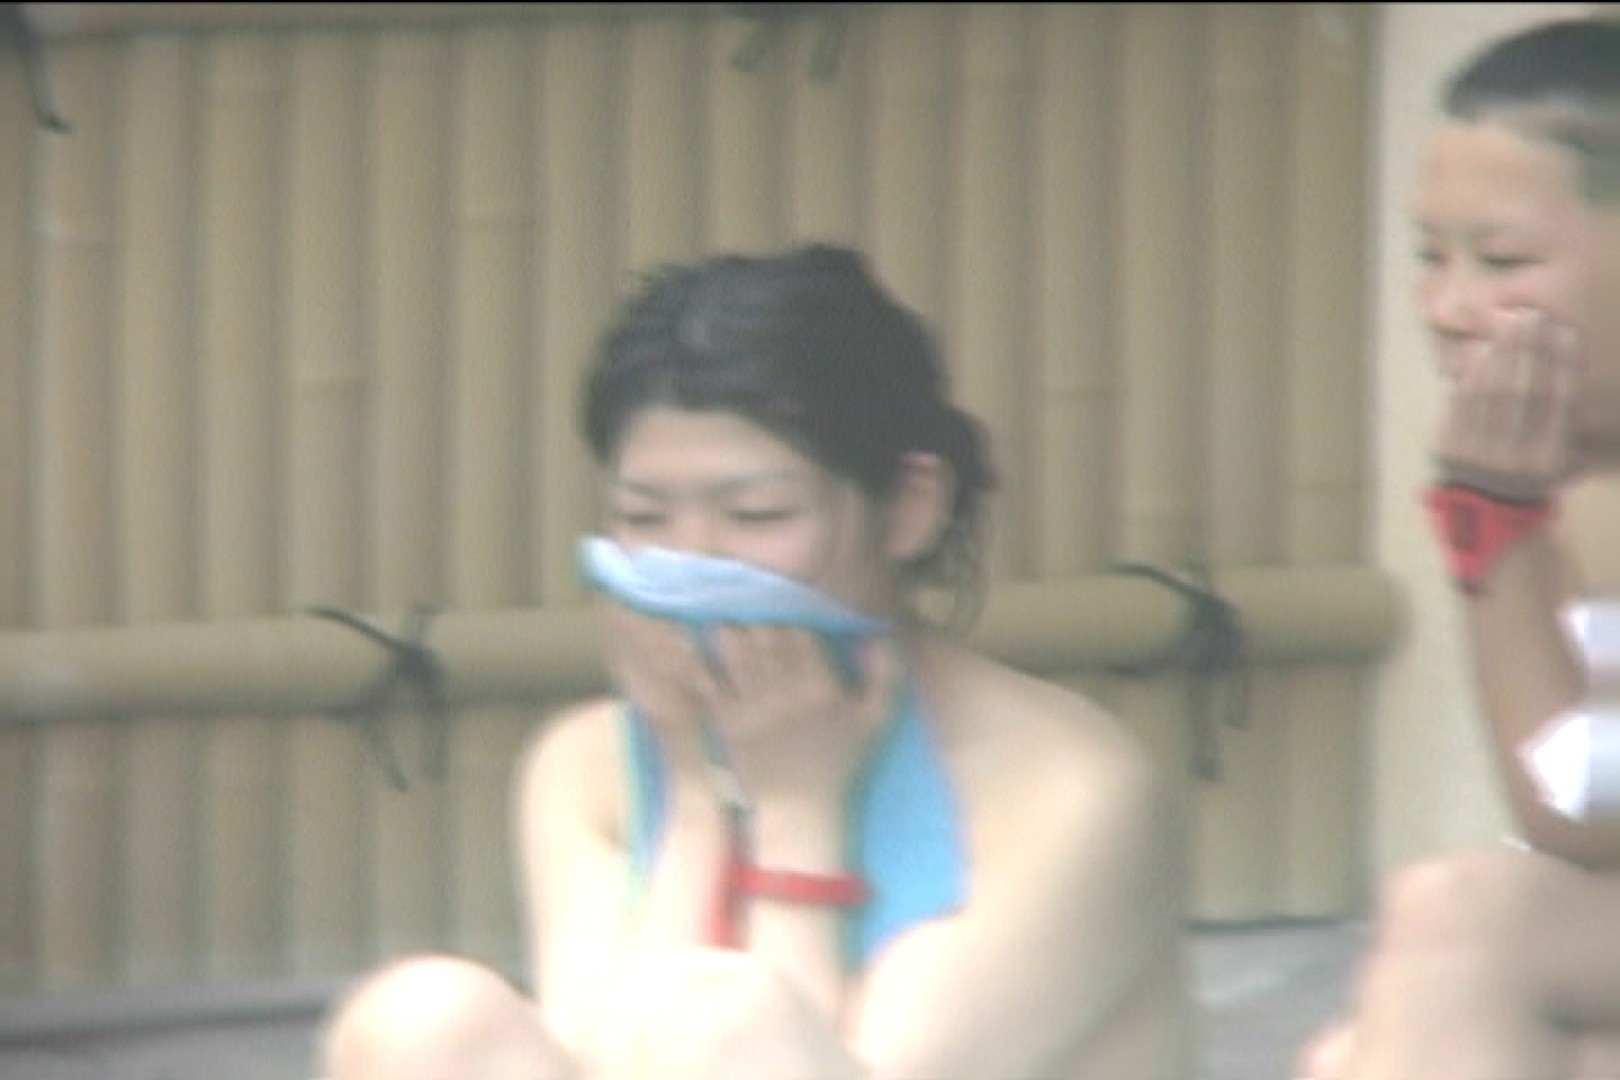 Aquaな露天風呂Vol.139 盗撮 | HなOL  53pic 52